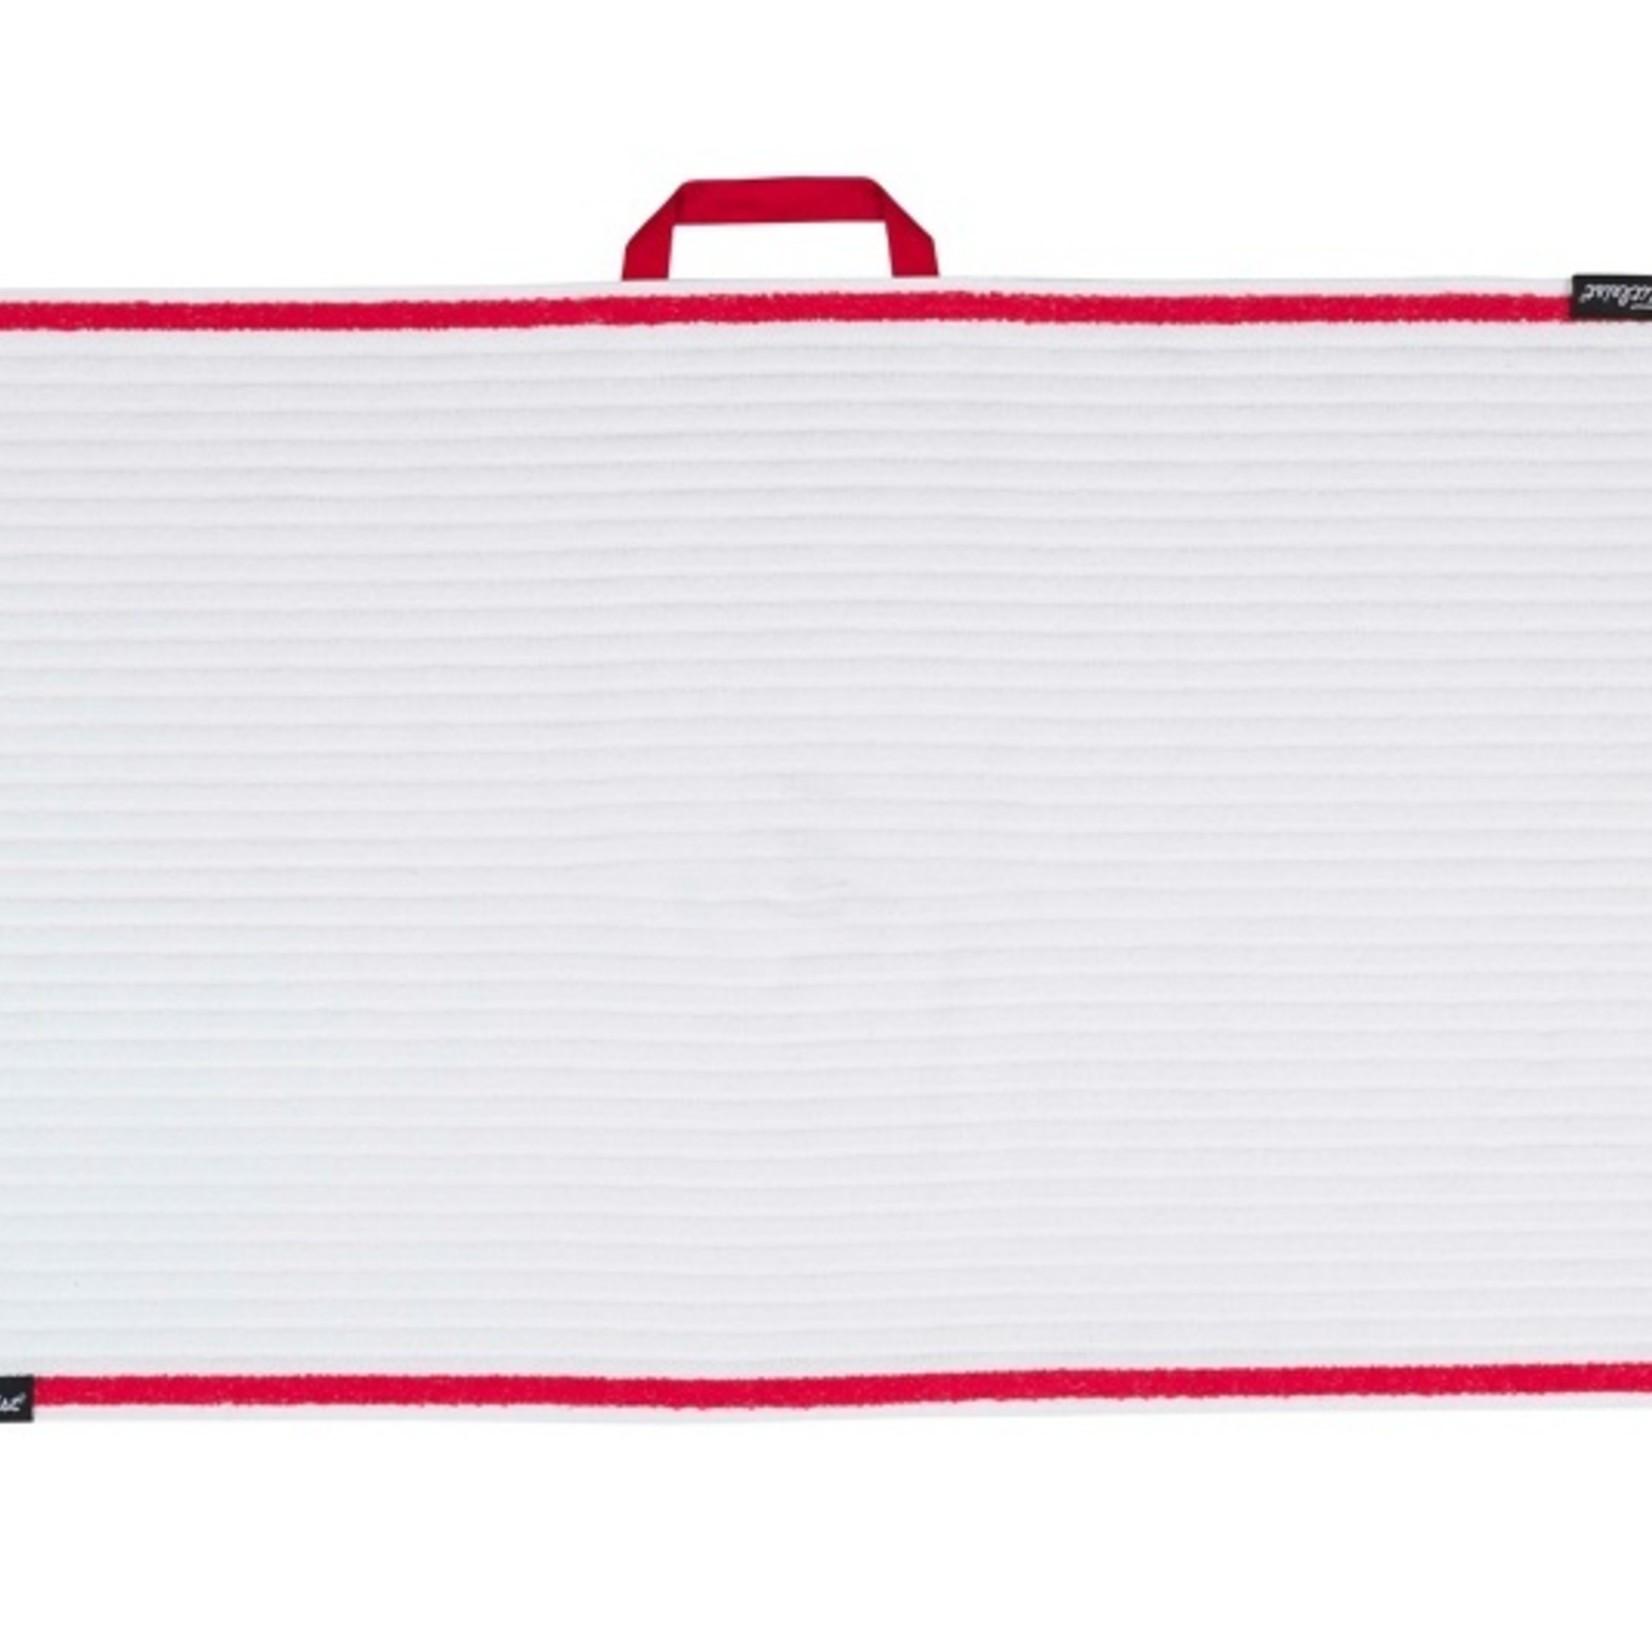 Titleist Titleist Tour Staff Towel